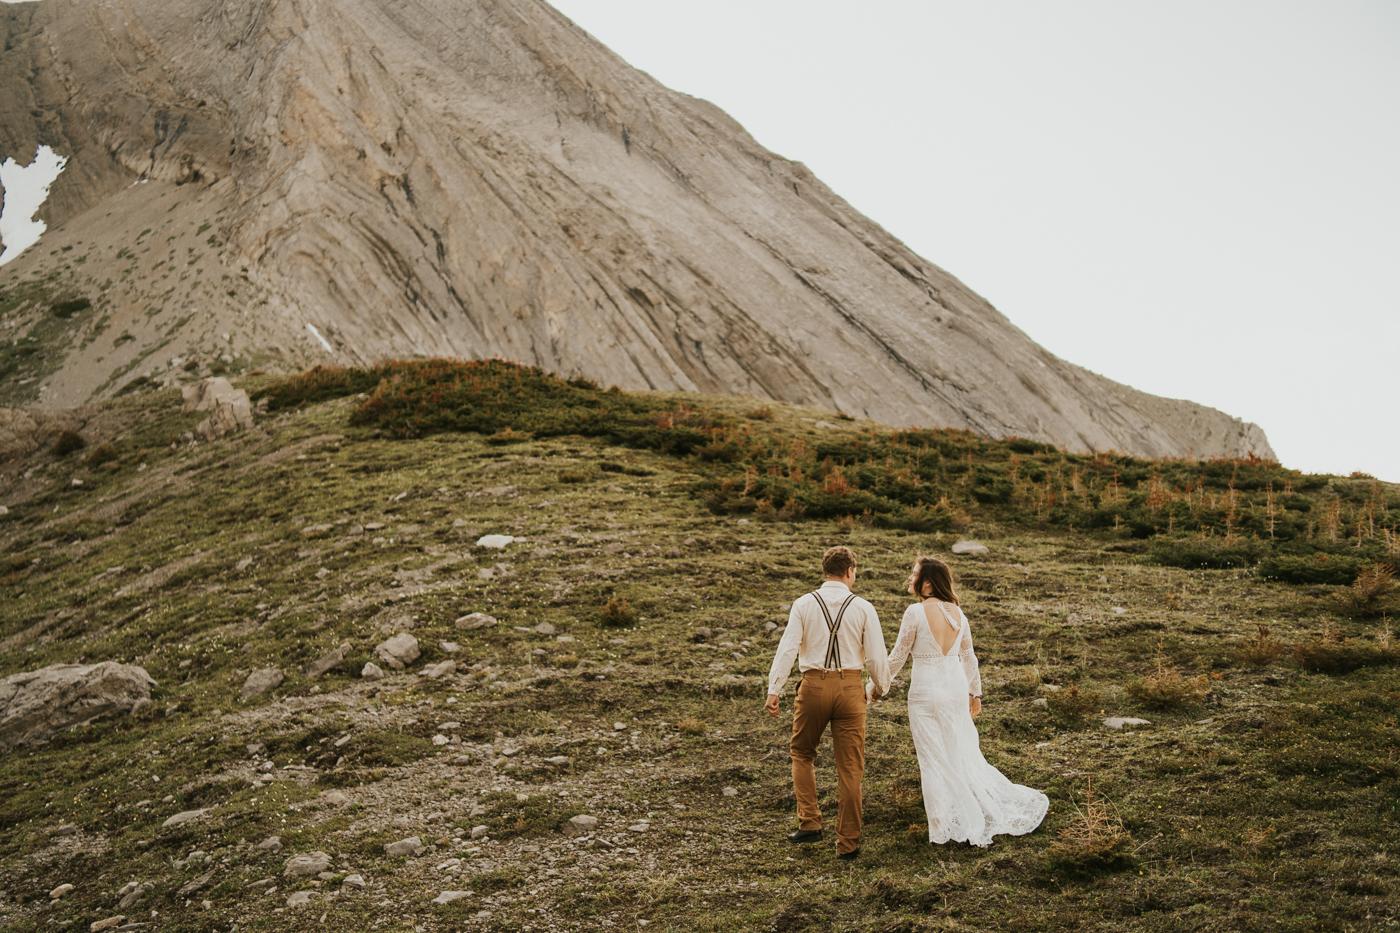 tyraephotography_photographer_wedding_elopement_engagement_photography-07718.jpg